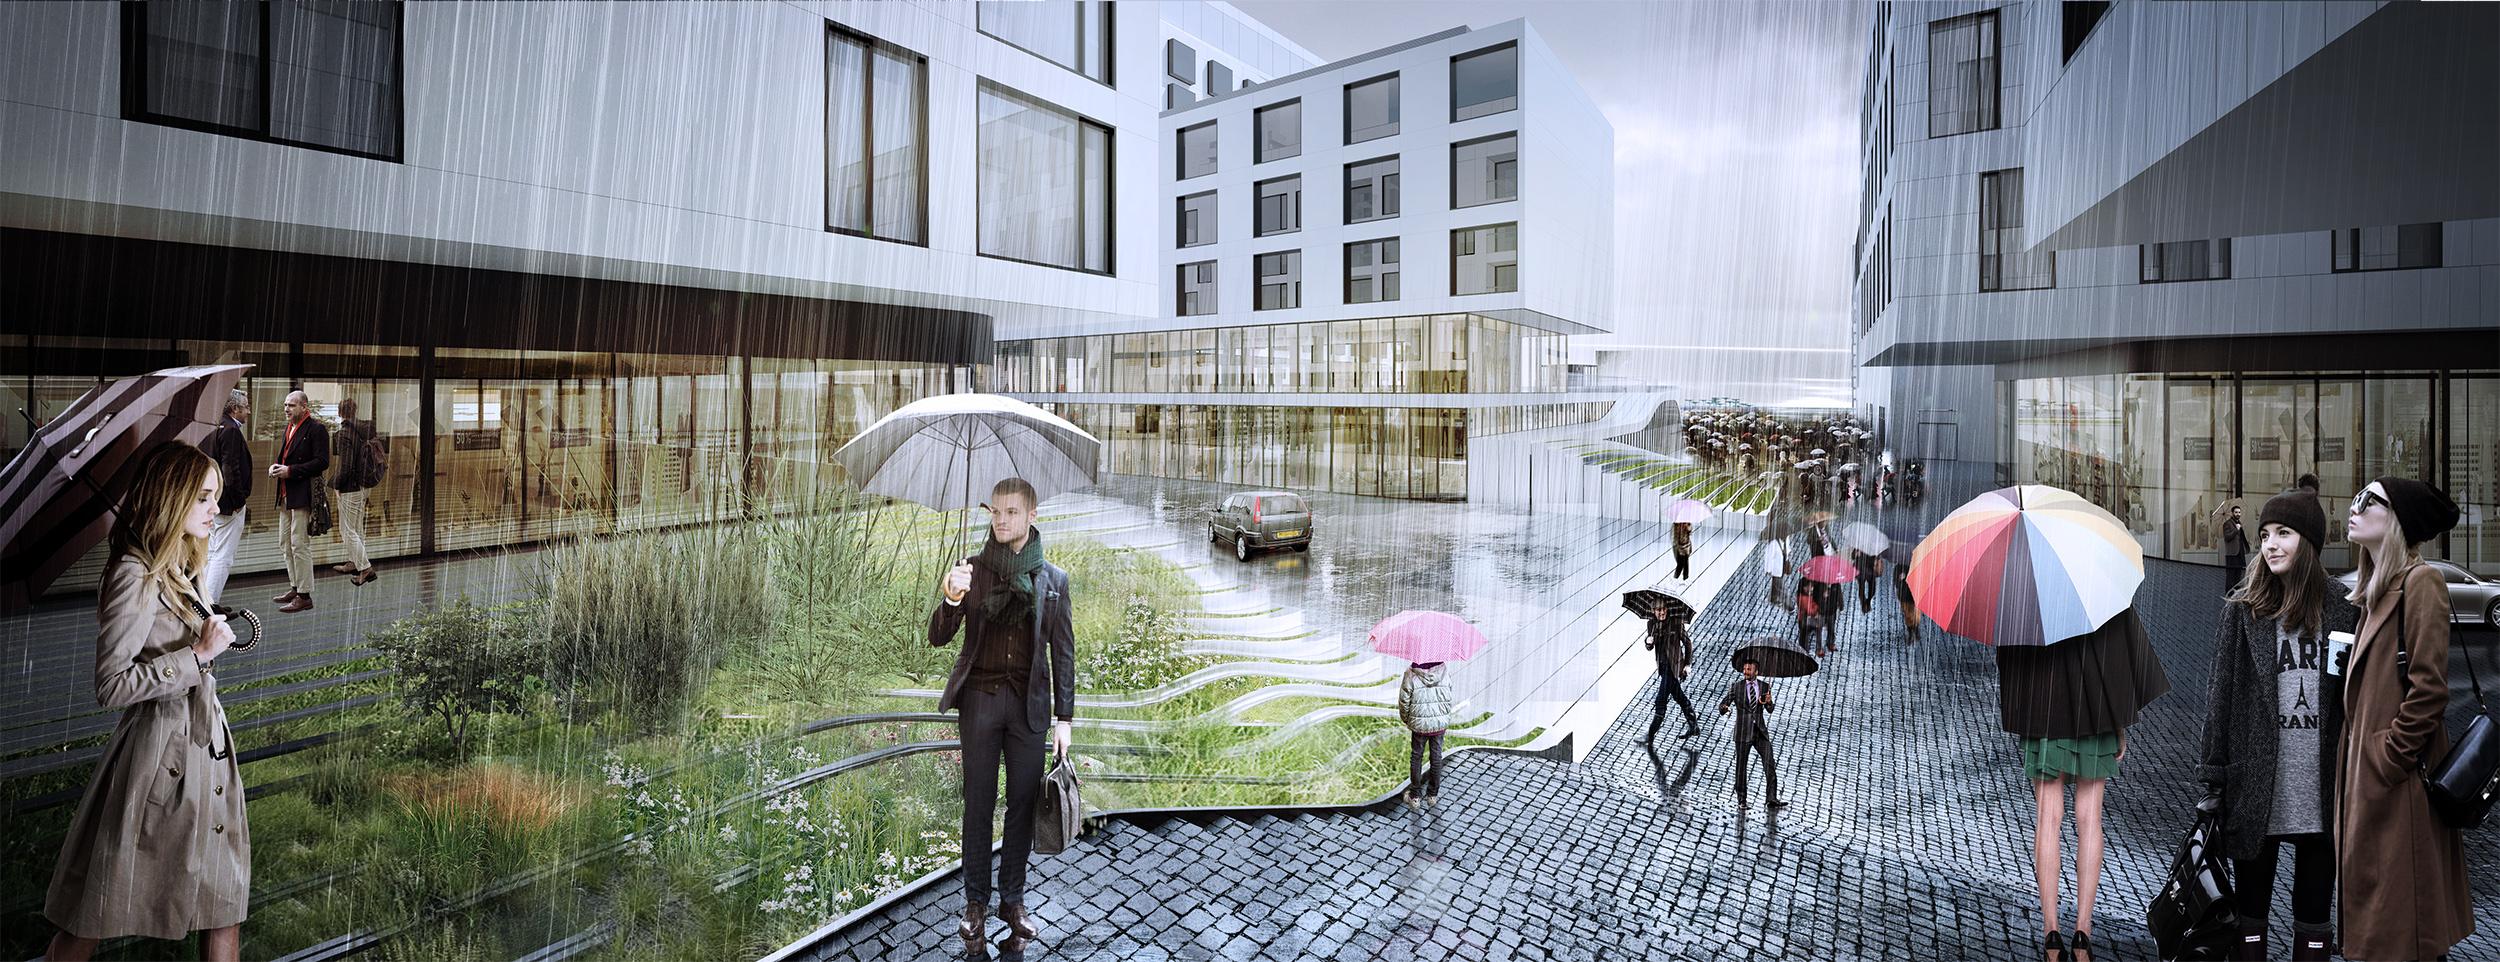 GDYNIA-Waterfront-Housing-MJZ-8